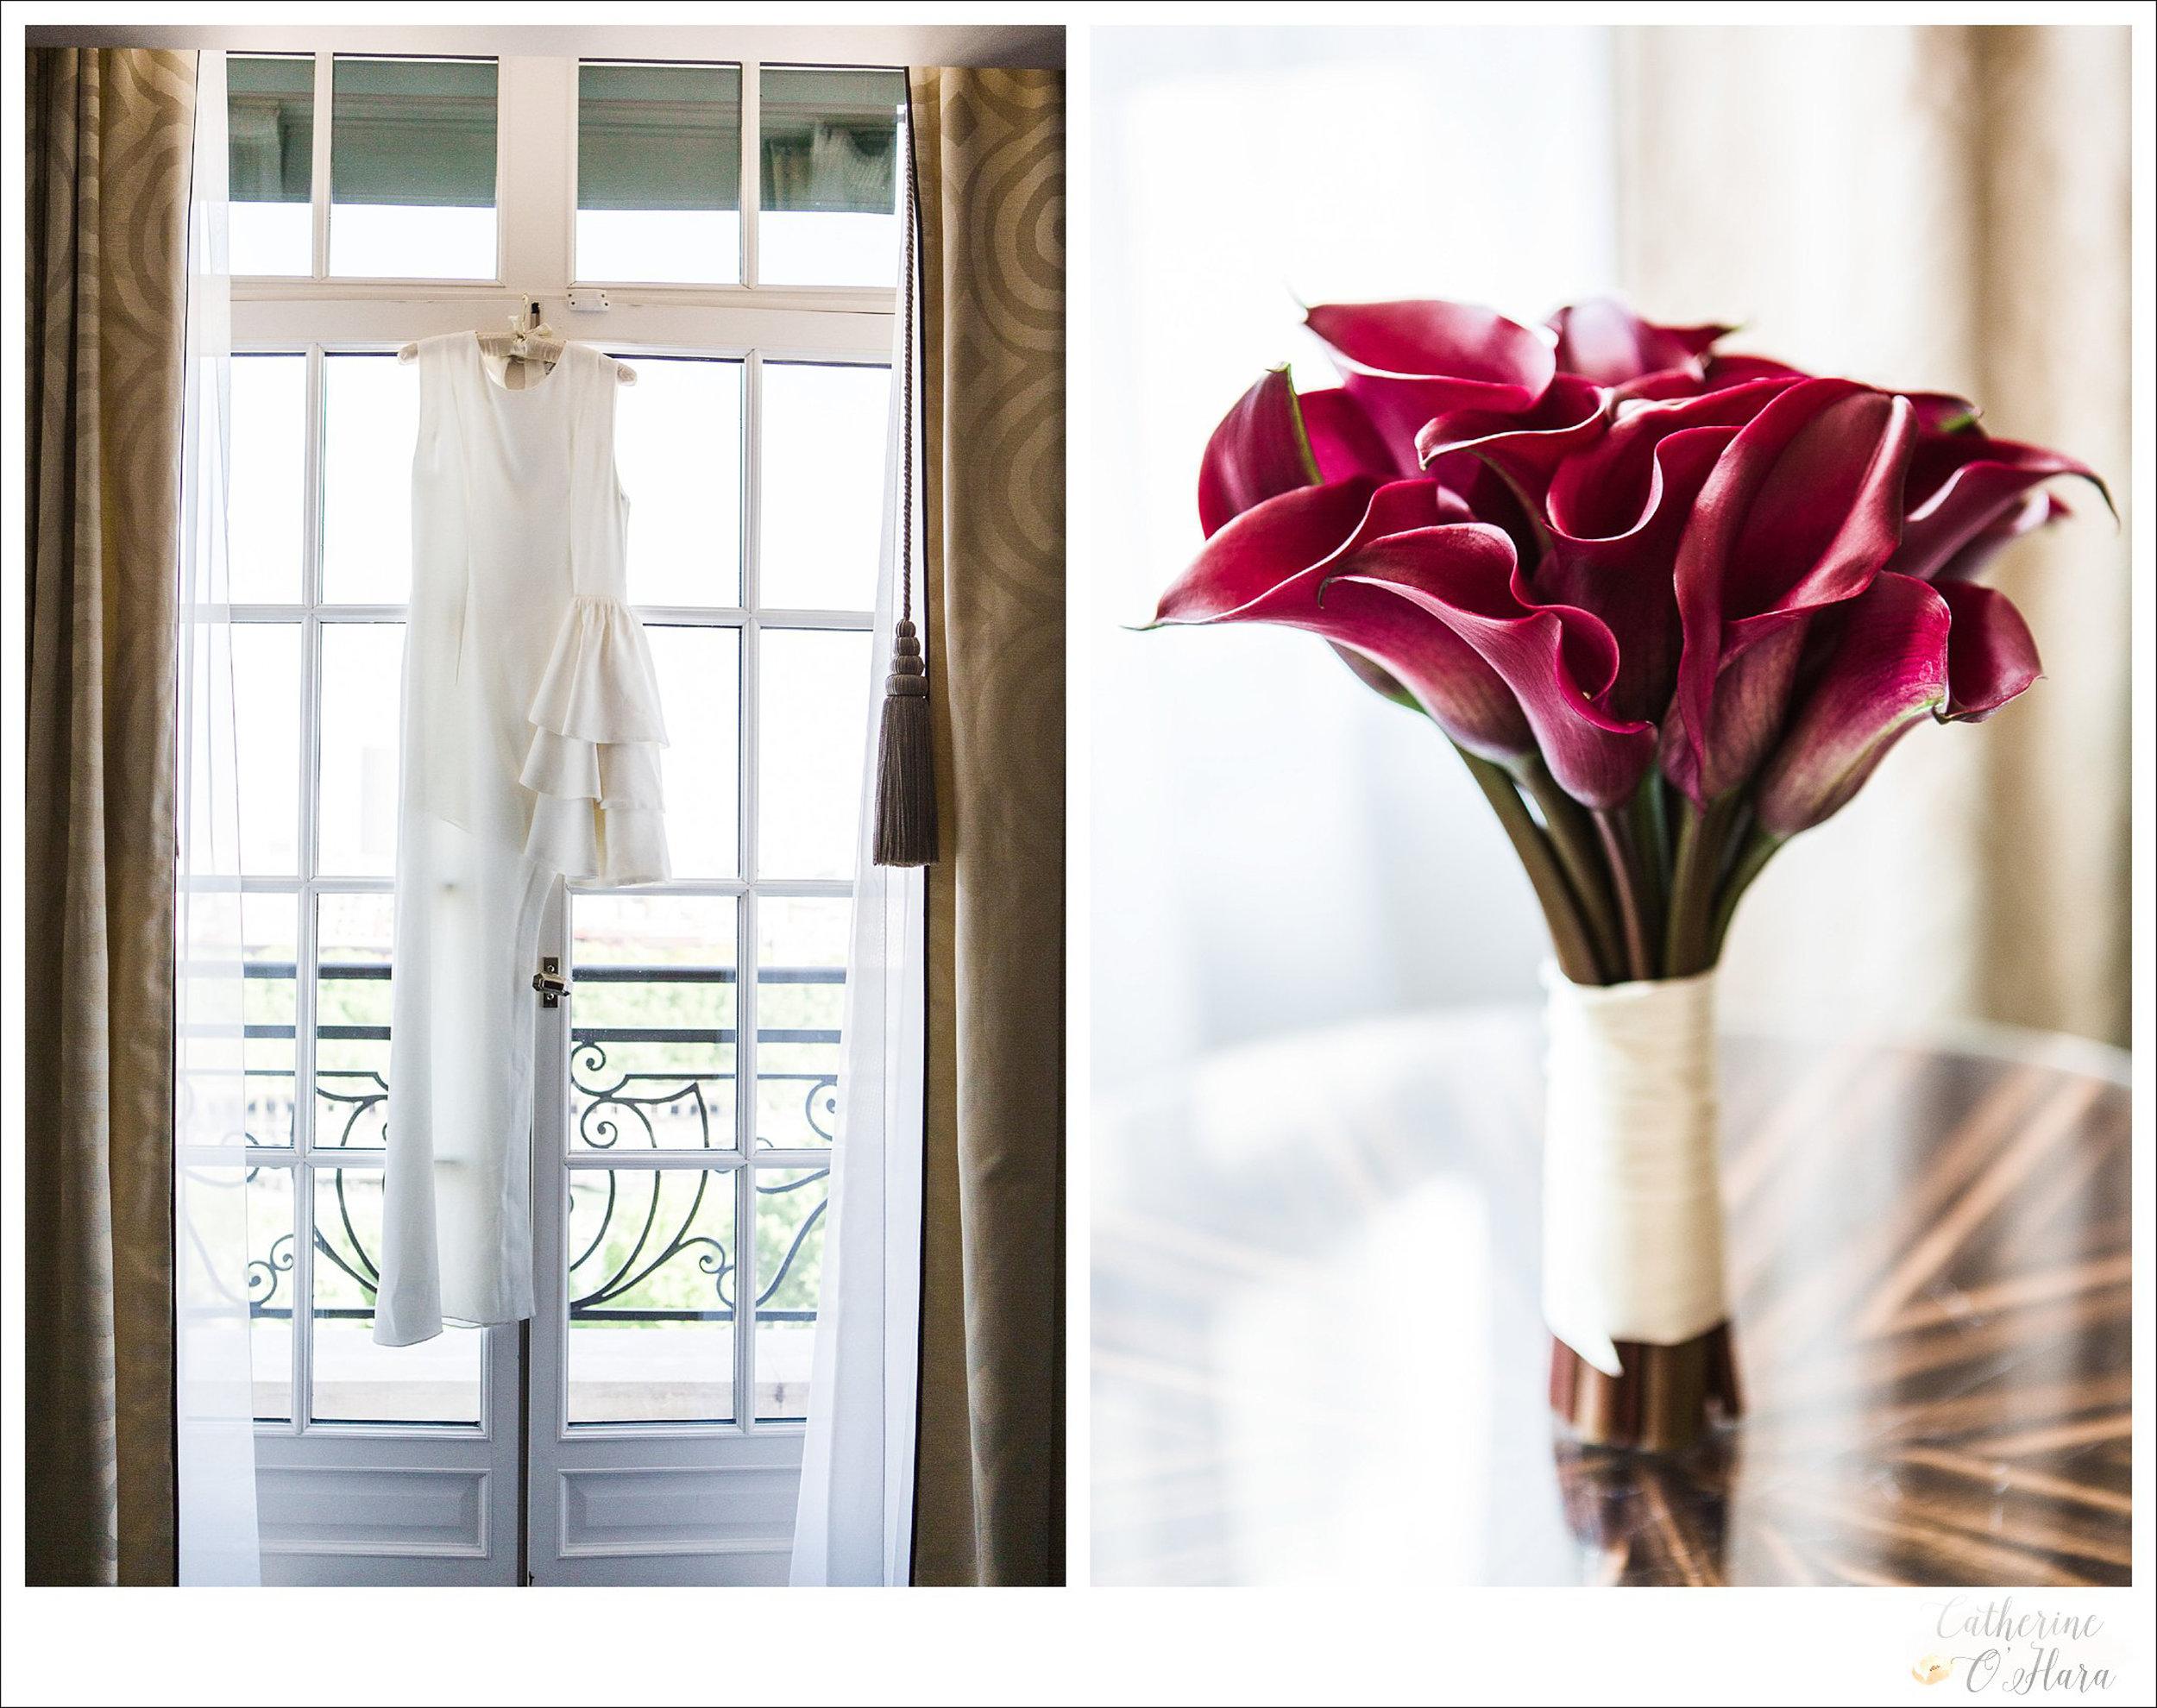 06-paris-france-elopement-photographer.jpg